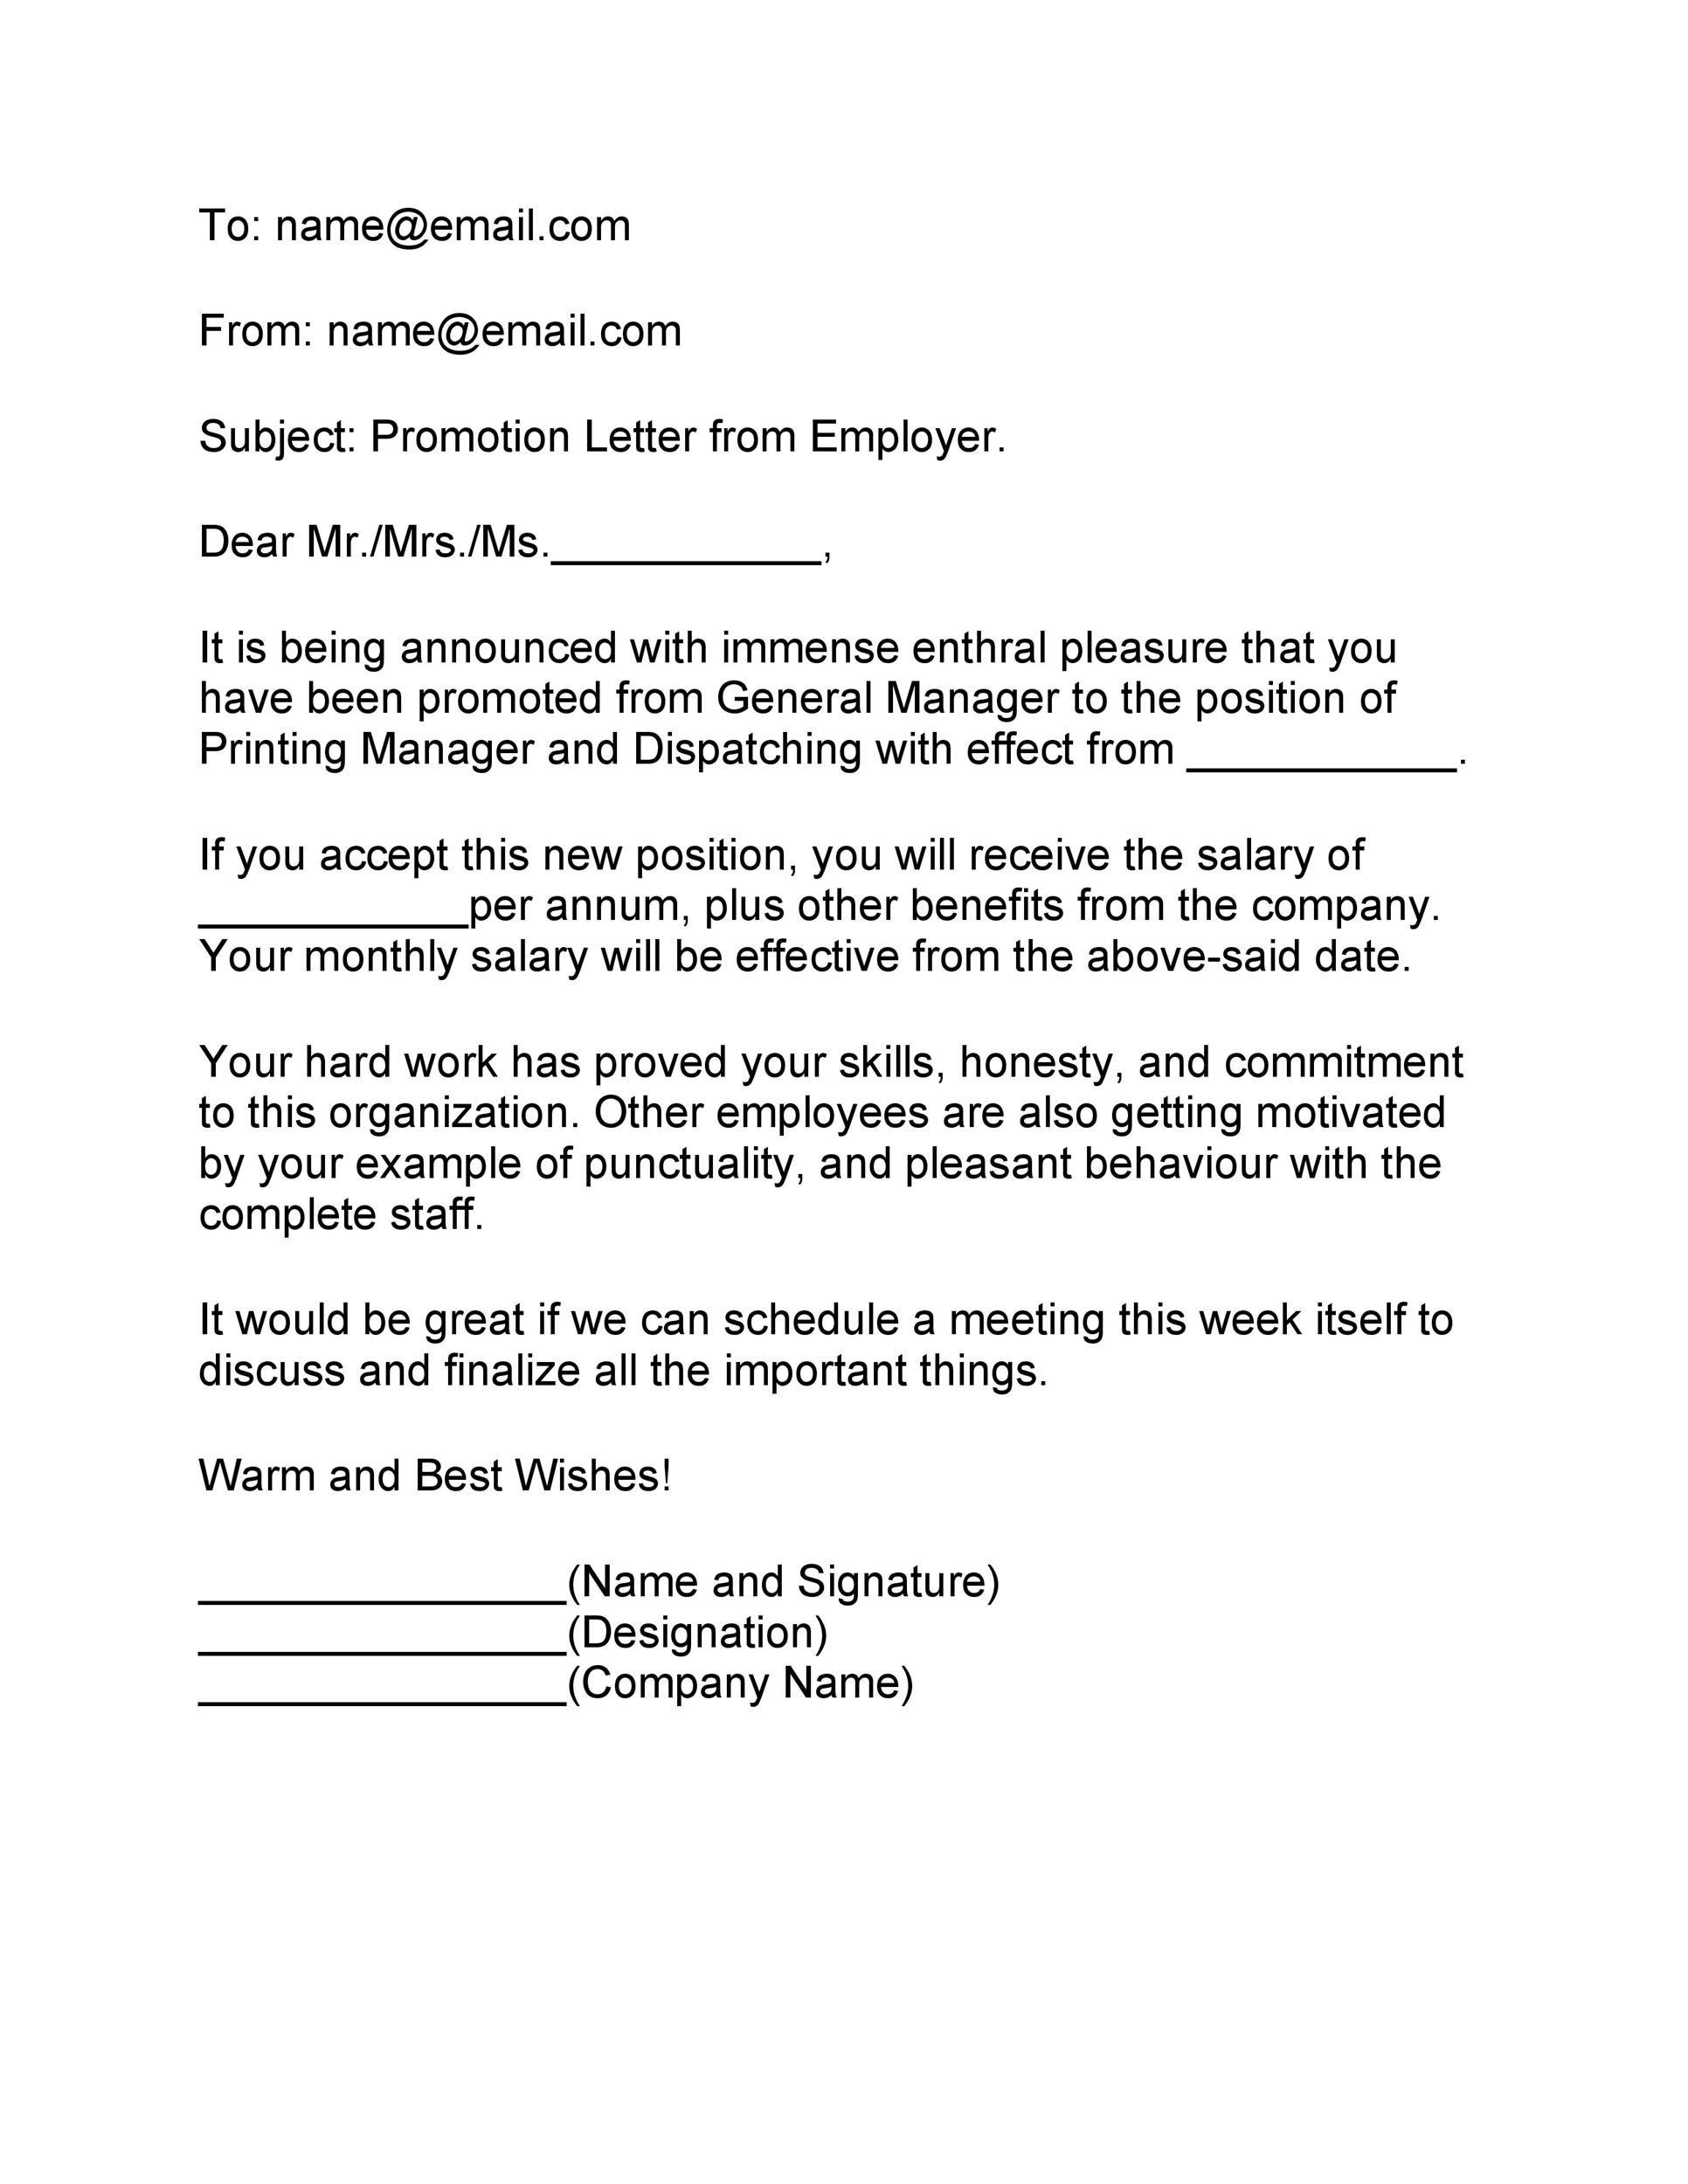 Free promotion letter 18